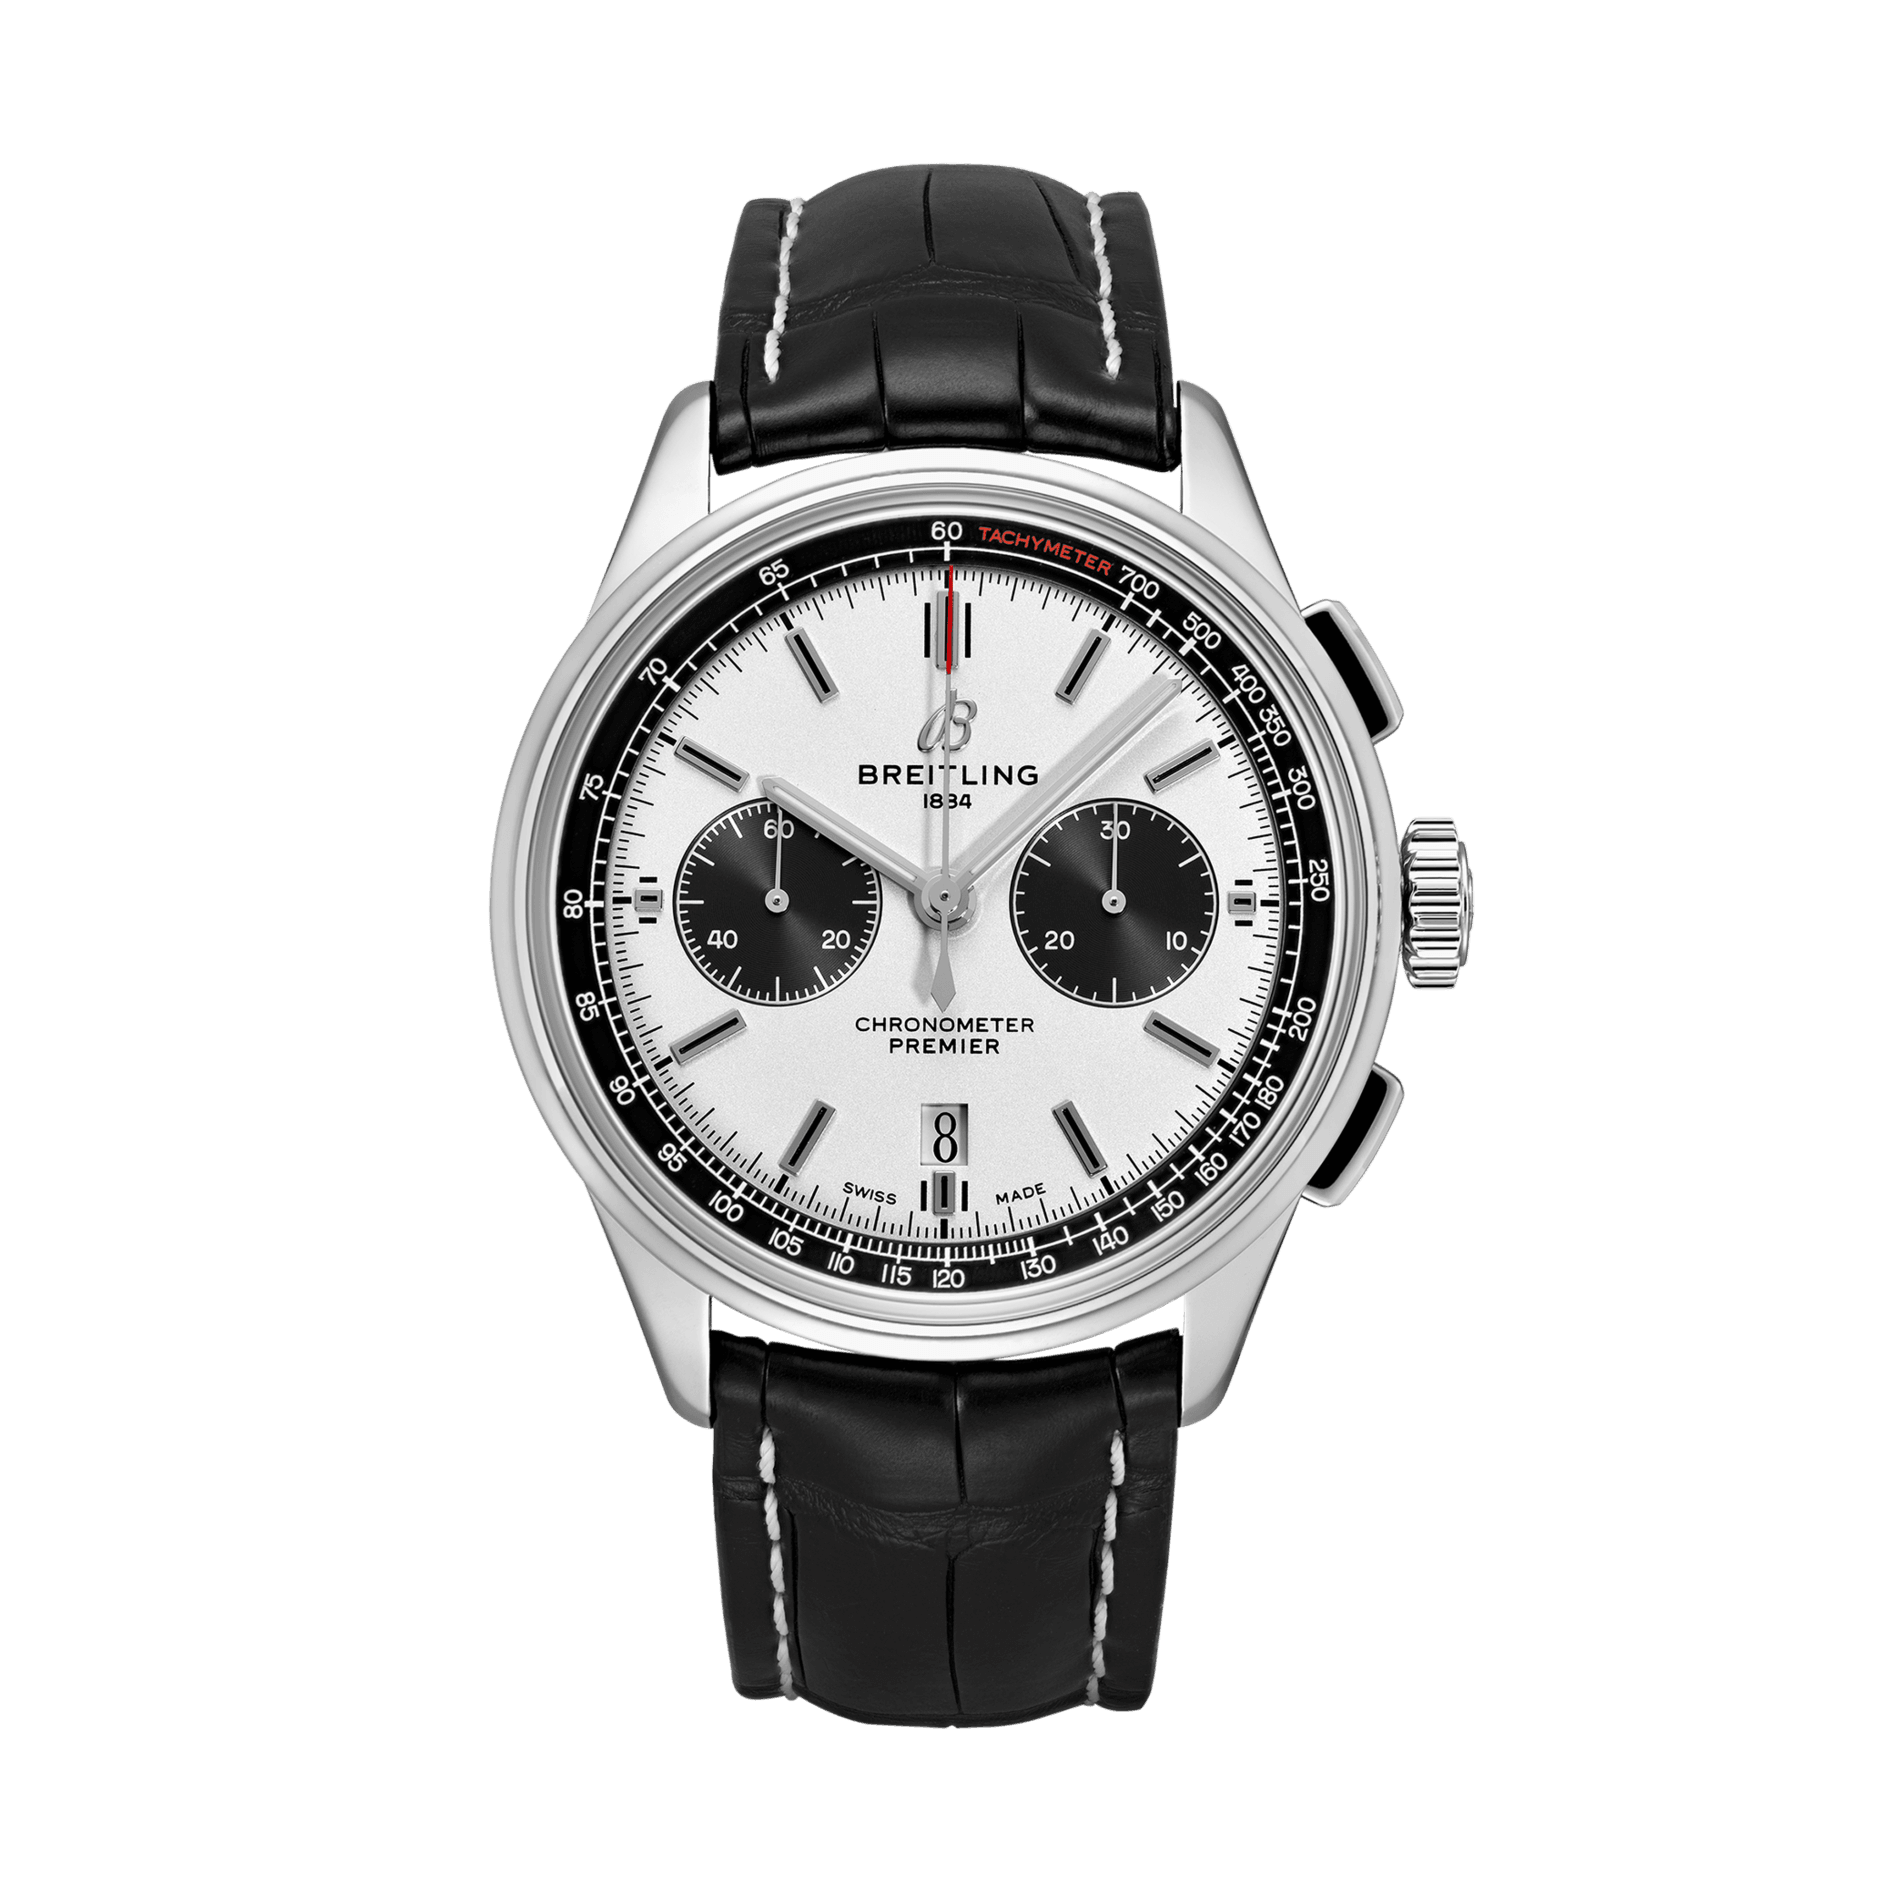 Reloj Breitling – Premier B01 Chronograph 42 - Amaya Joyeros